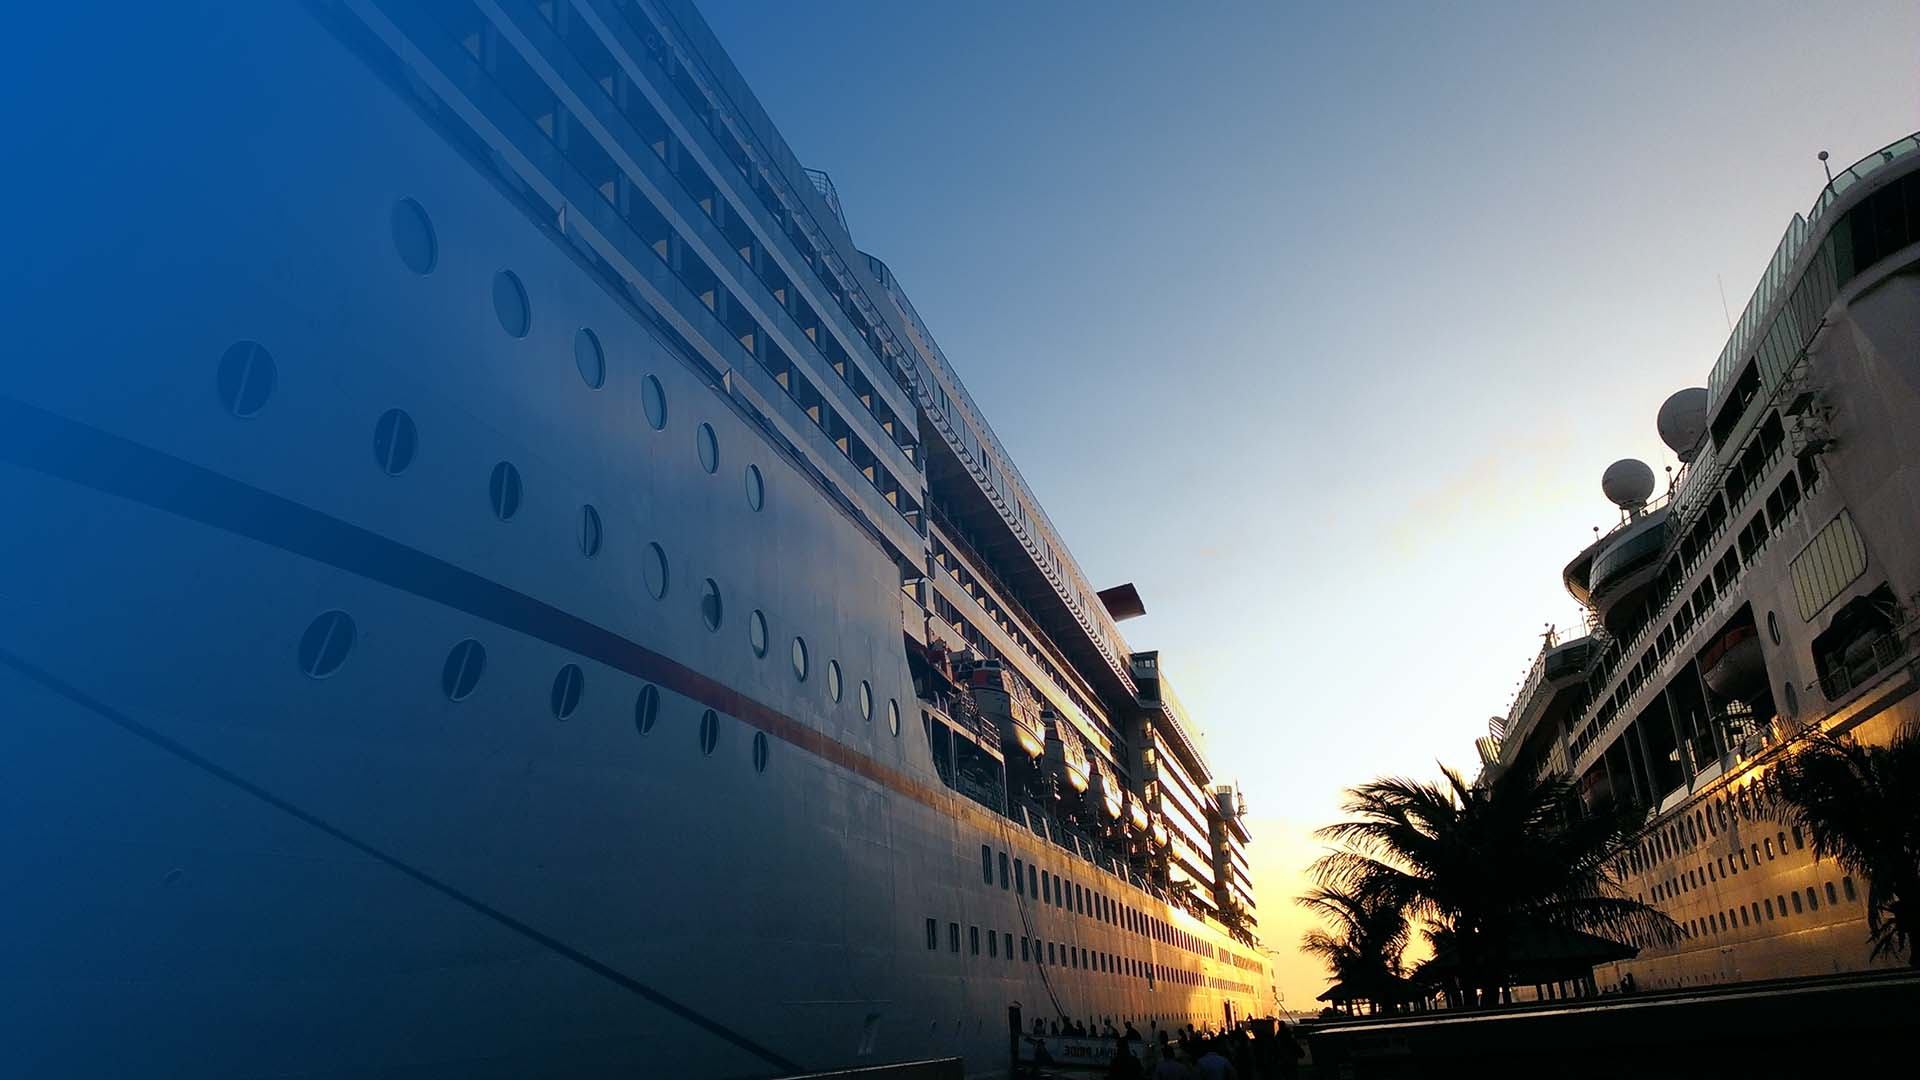 Cruise Ships at Port Image